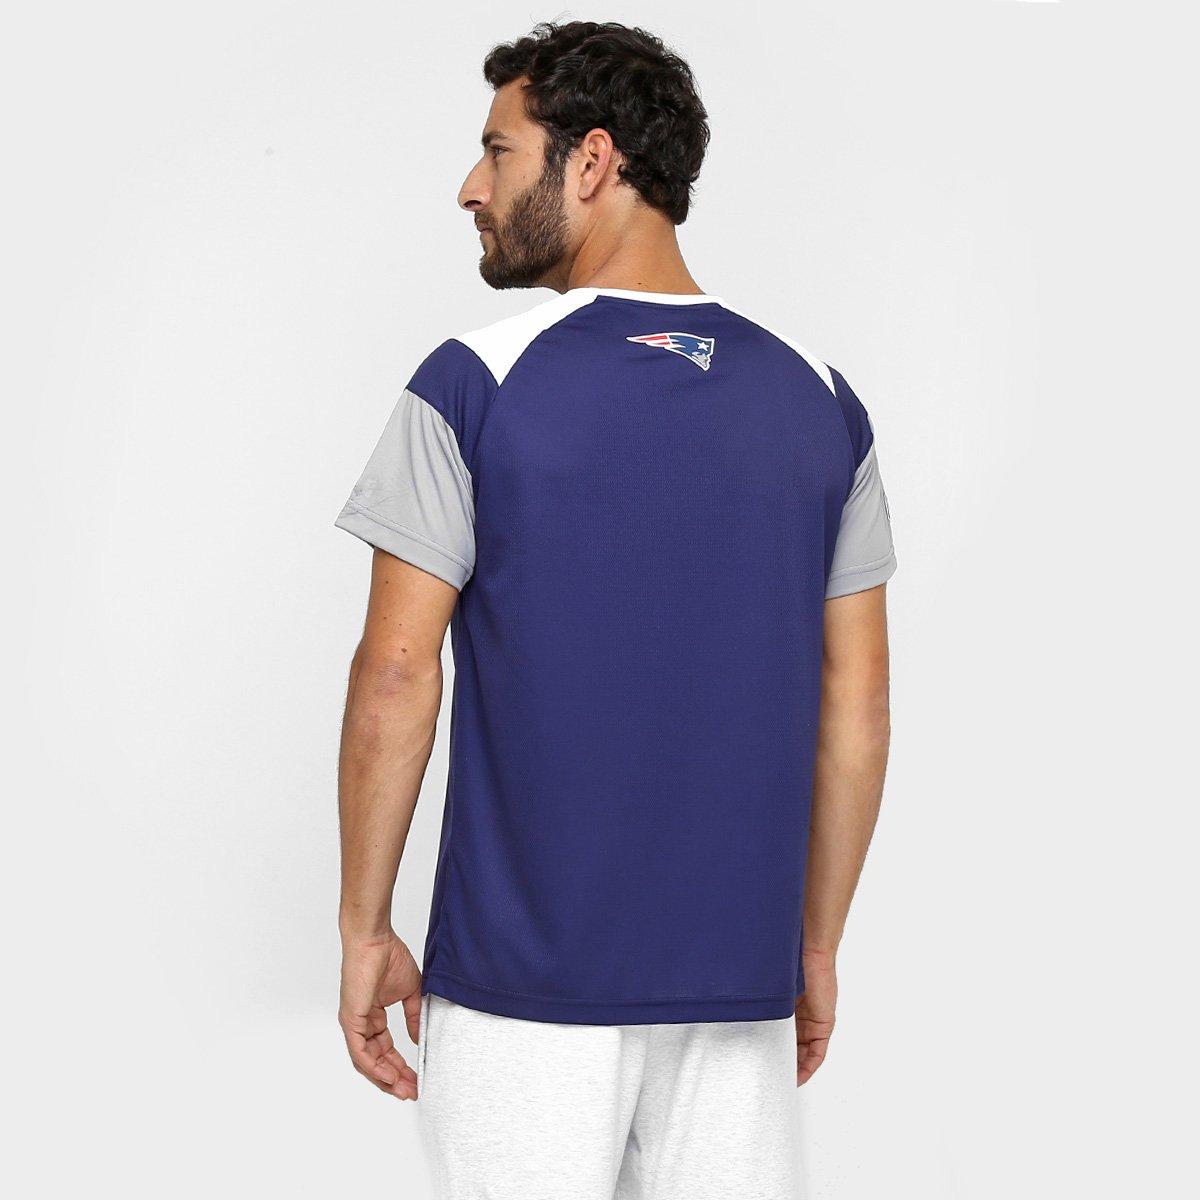 Camiseta New Era NFL Raglan Recorte New England Patriots - Compre ... 3bc246247e5